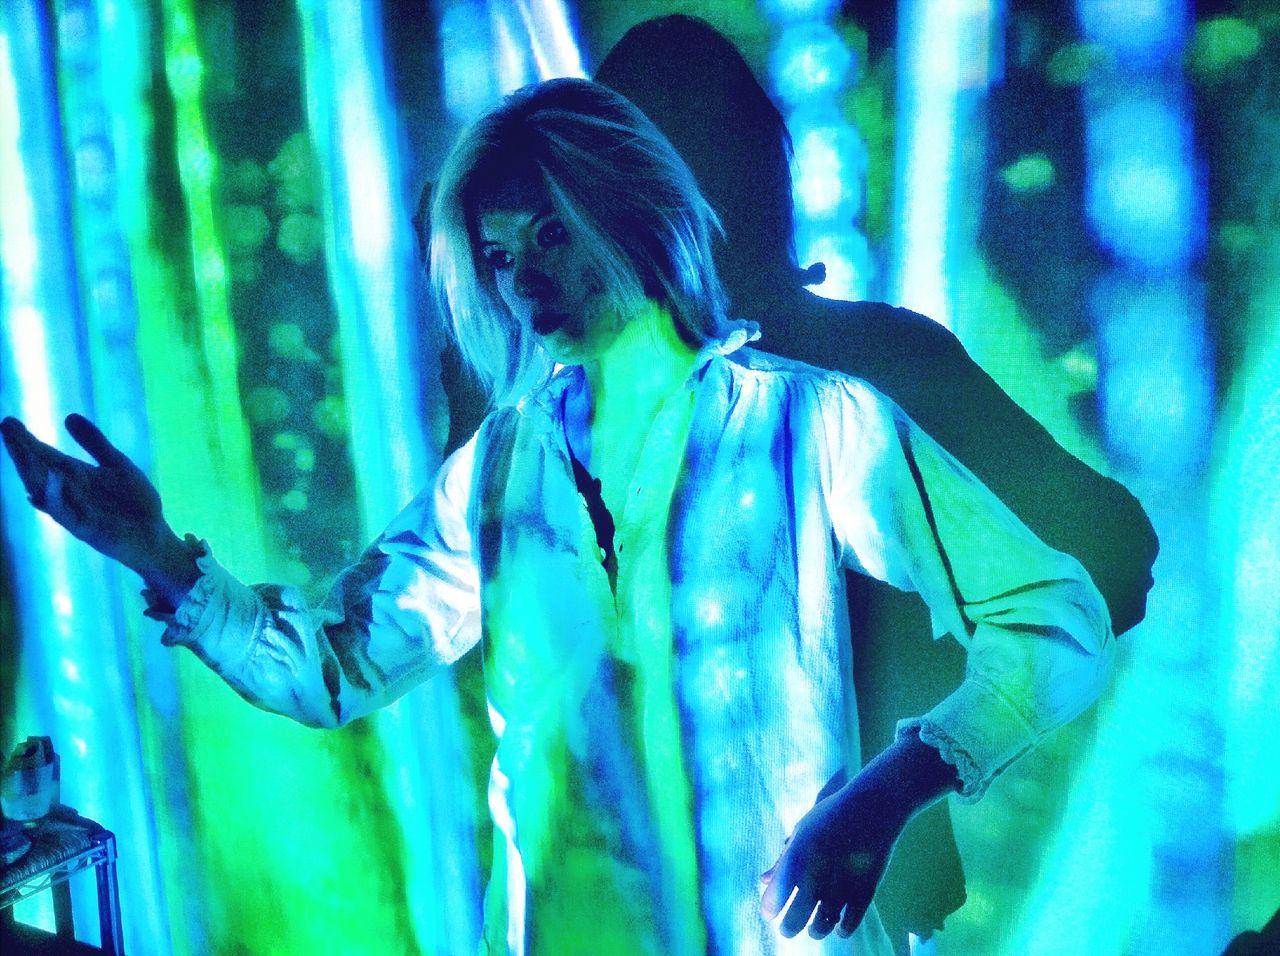 Woman Gesturing In Illuminated Room